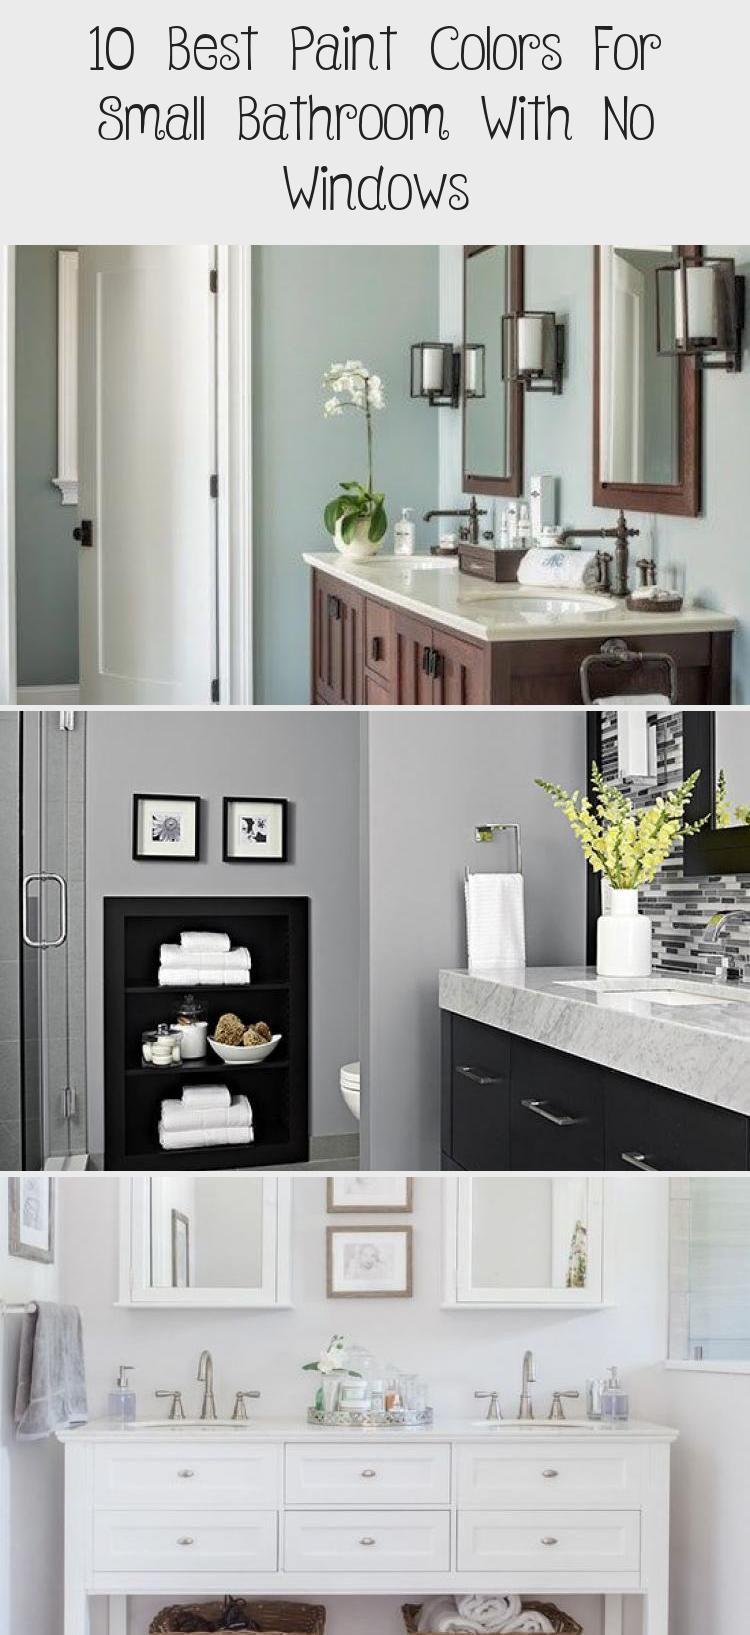 Blue Gray Bathroom Paint Color Blue Gray Bathroom Ideas Navy Blue Bathroom Decor Ideas Paint Colo Small Bathroom Colors Small Bathroom Paint Small Bathroom